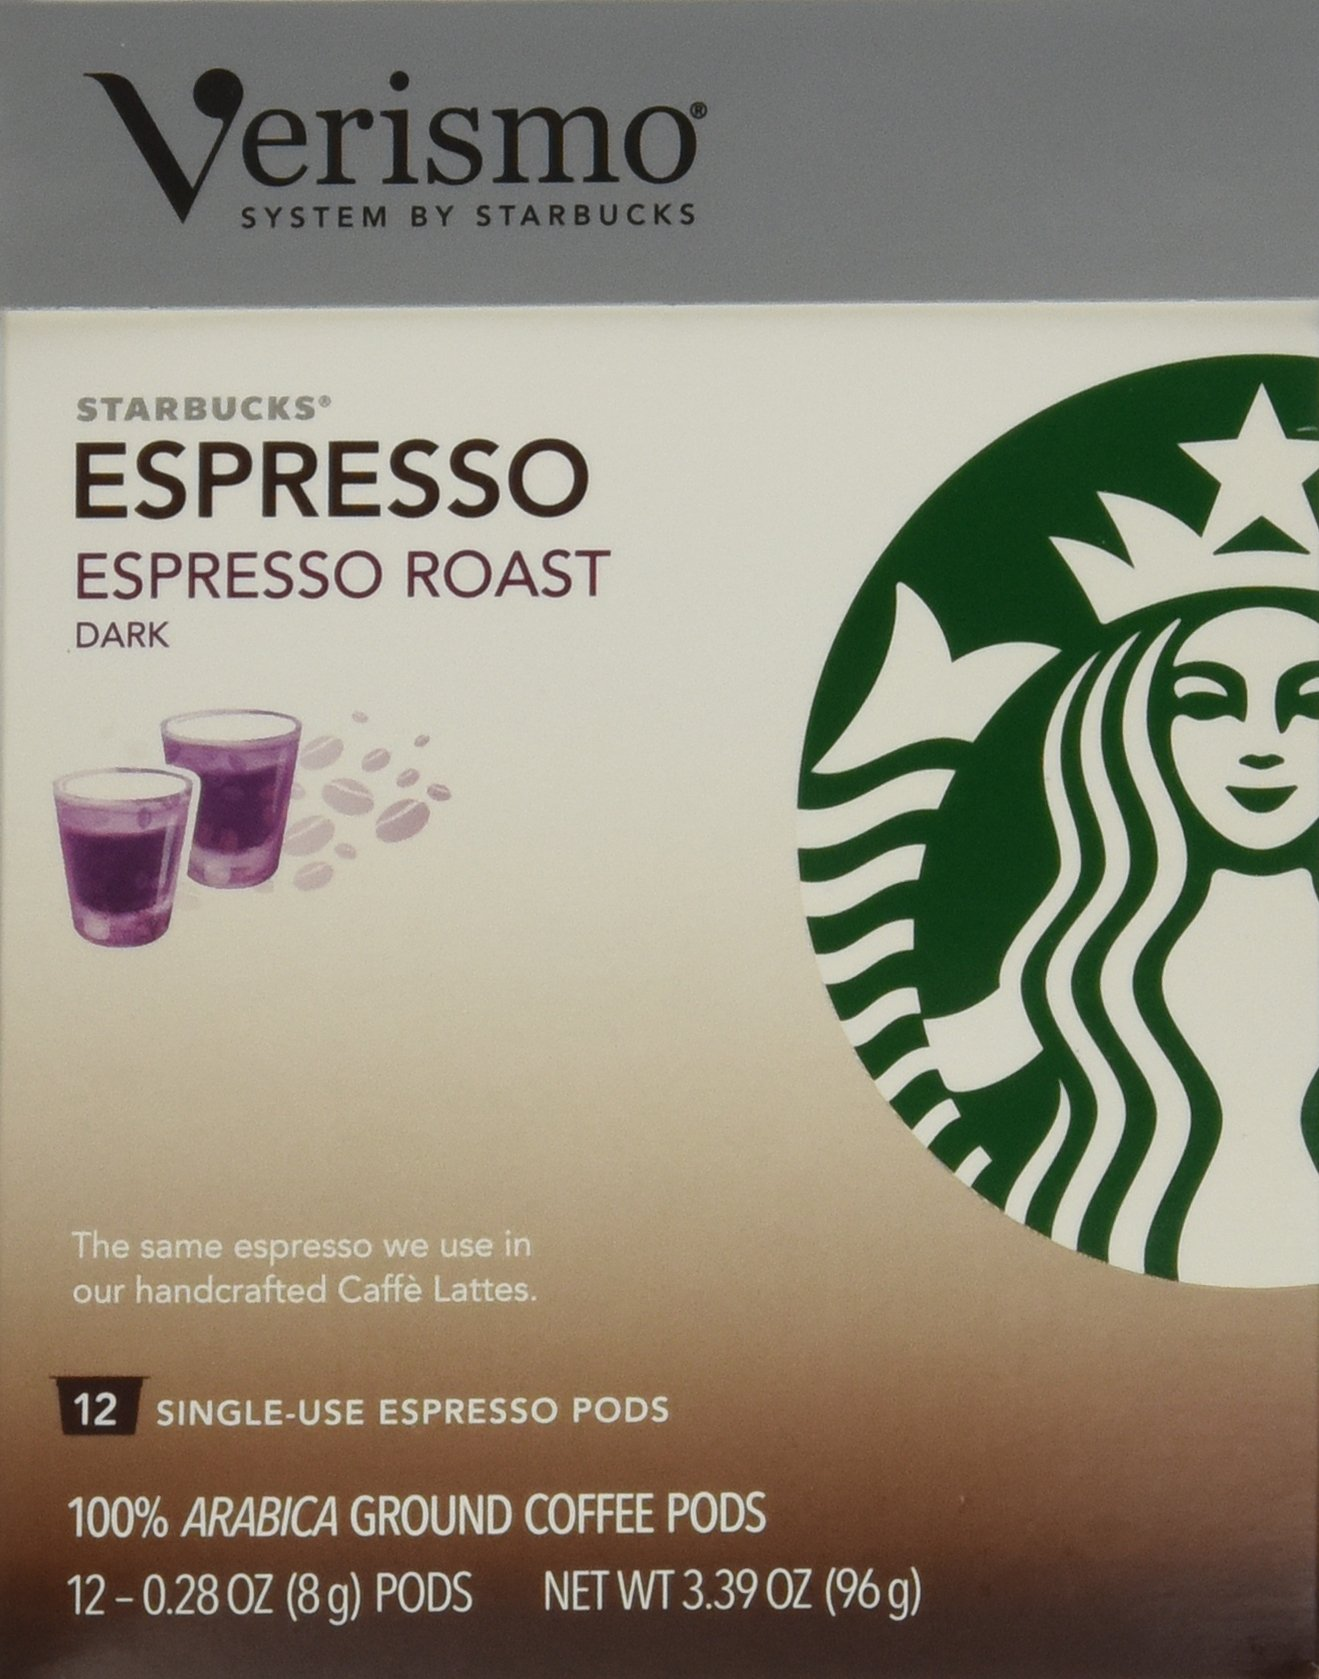 Starbucks Verismo Espresso Roast Espresso, 72 Pods